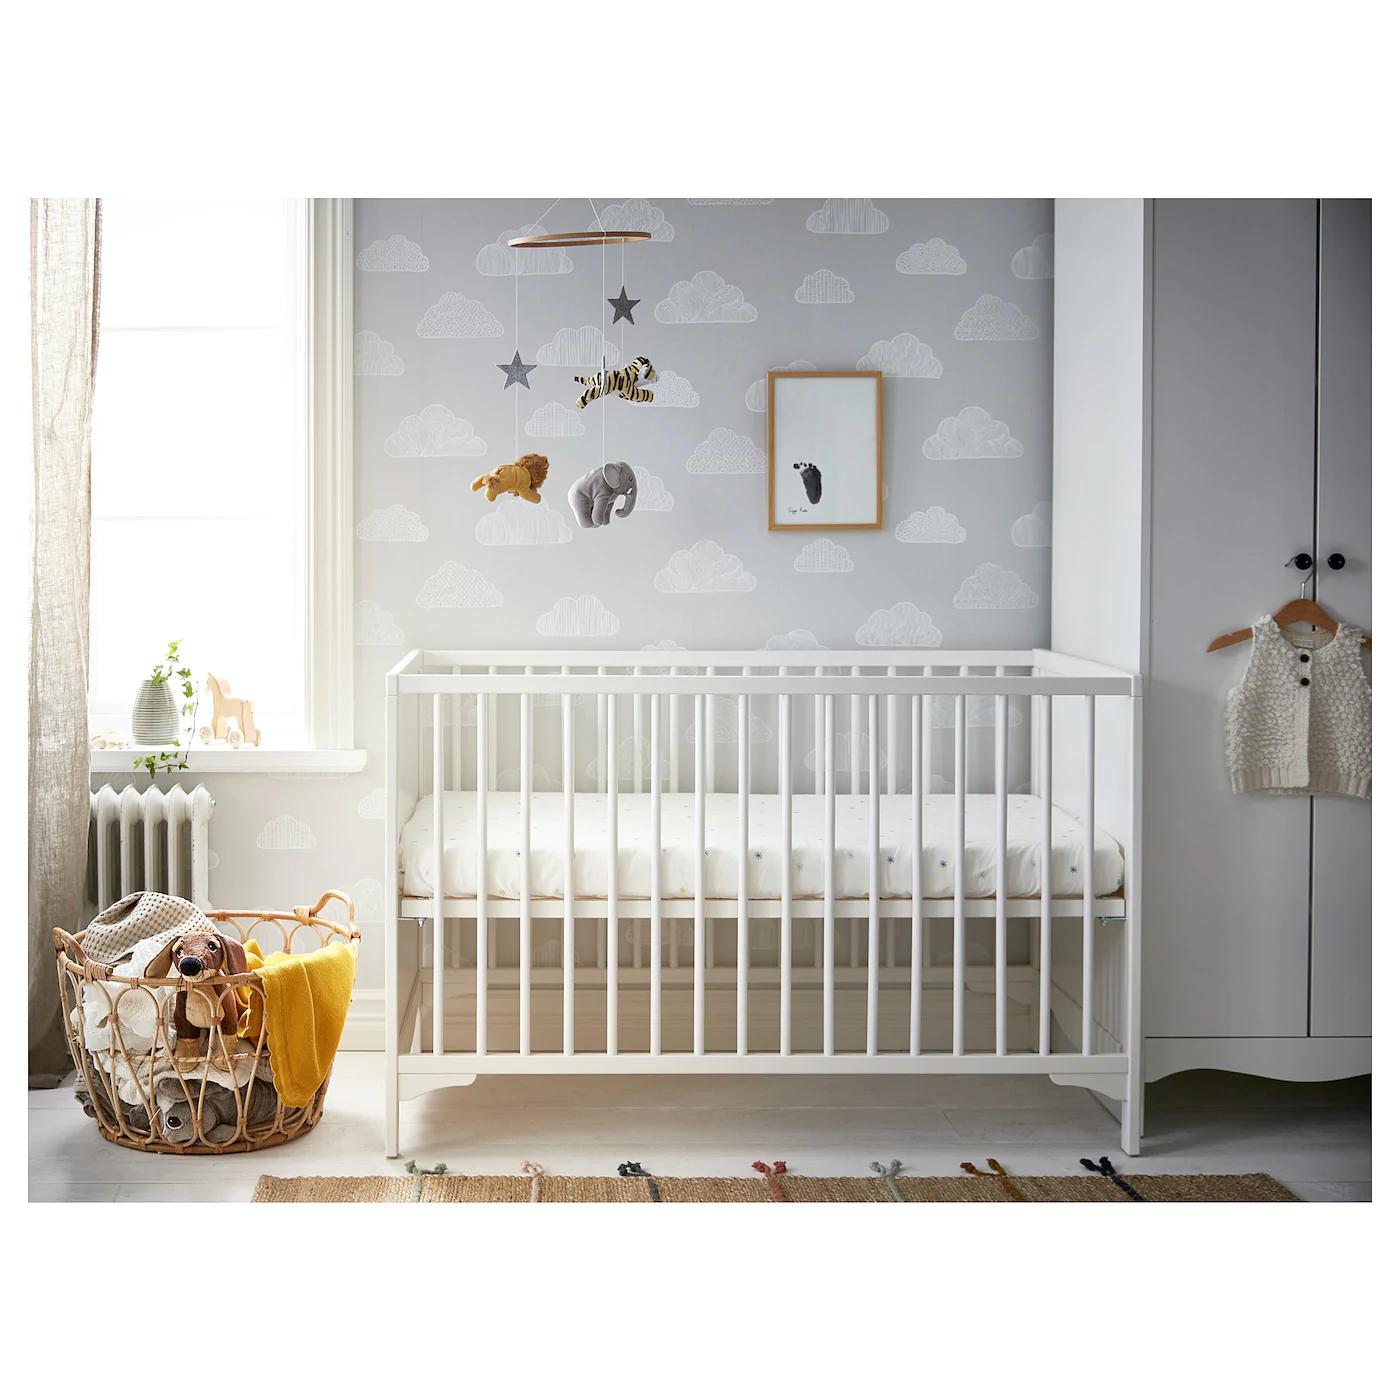 Ikea Solgul Baby Cot White 60x120 cm £50.00 @ Ikea (In-Store)